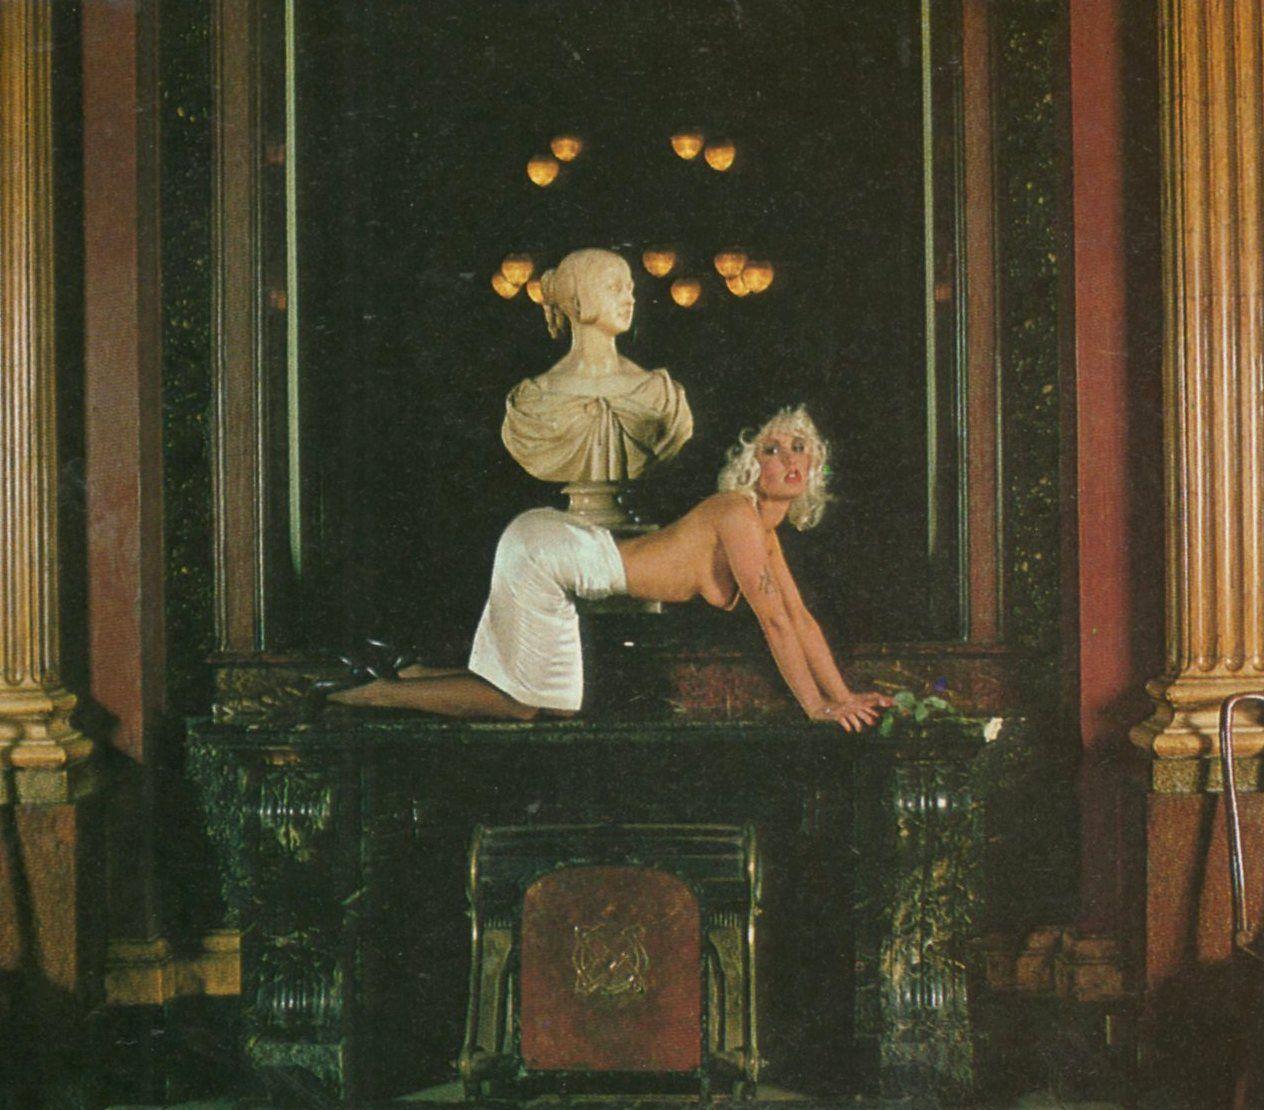 Barbara rhoades nude pics